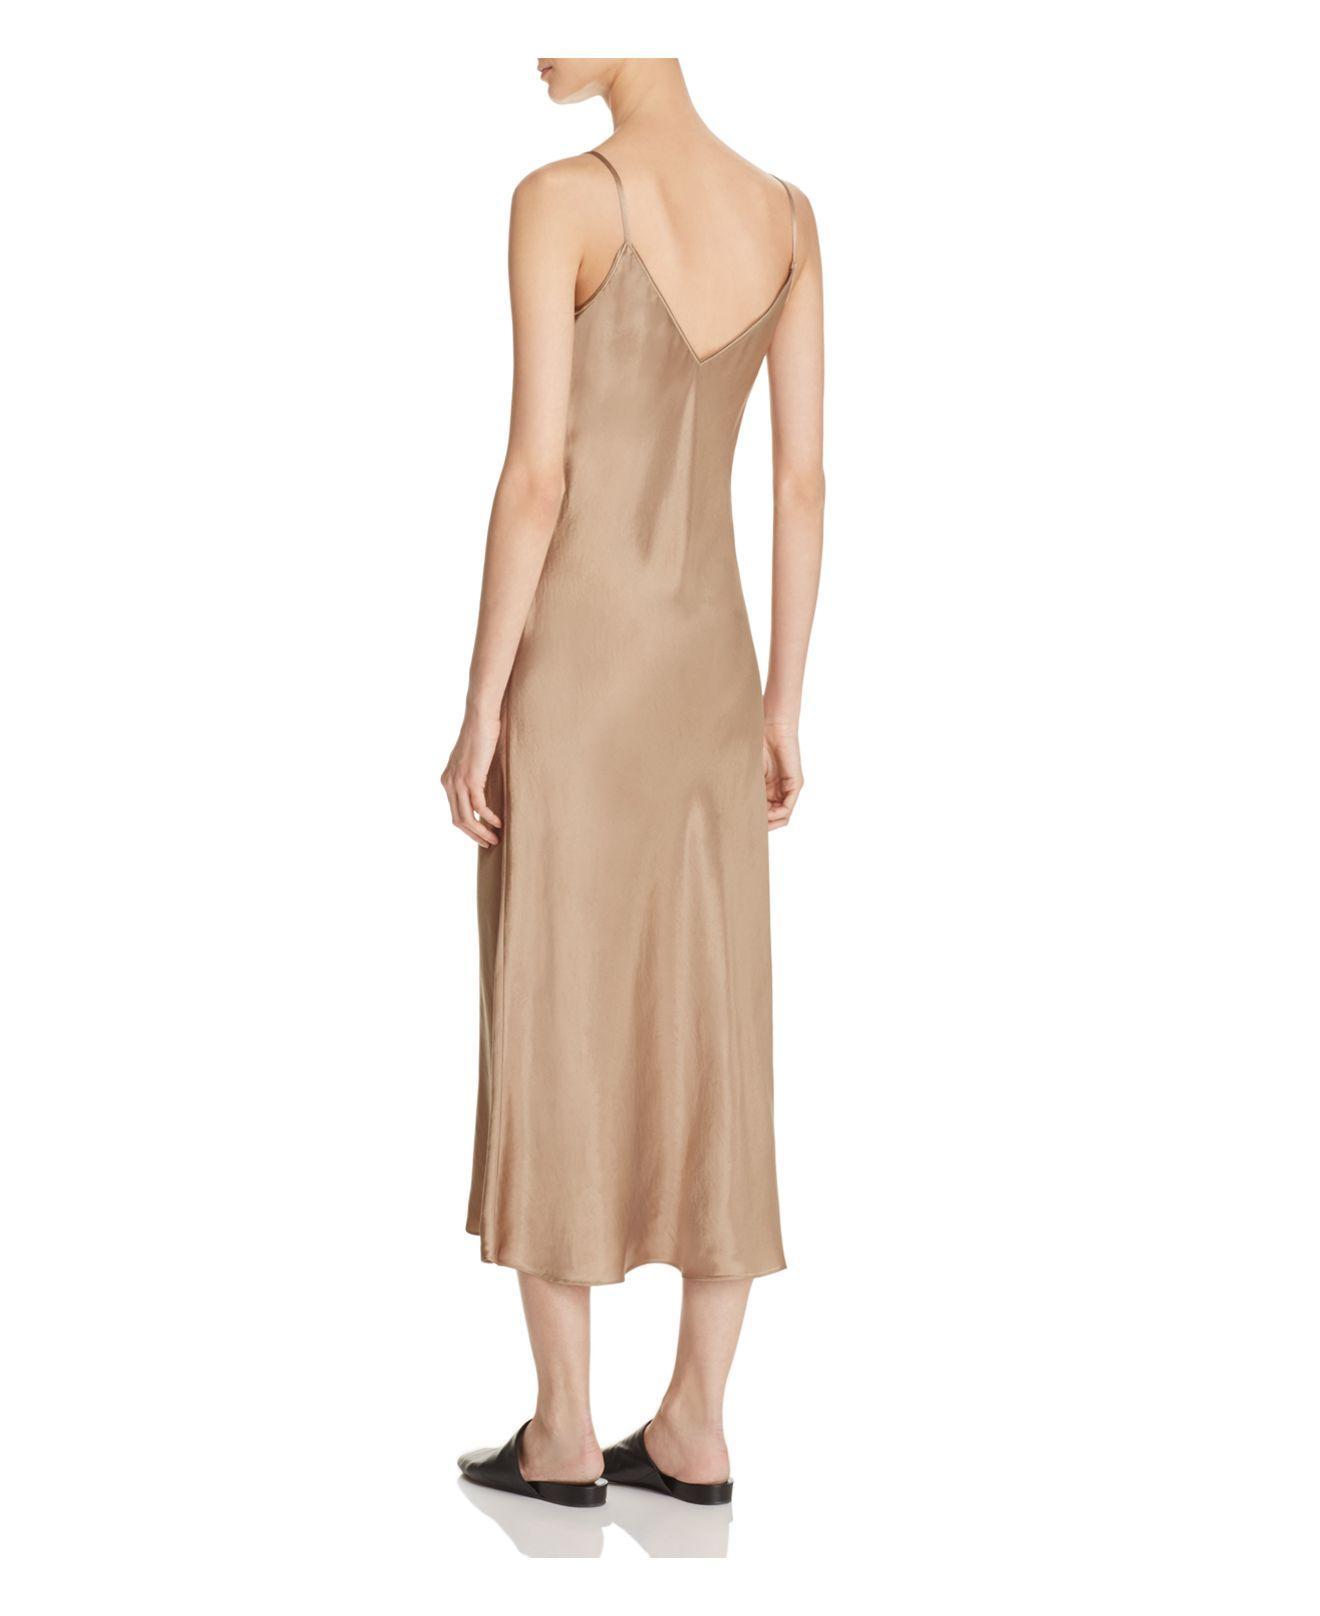 Vince Satin Slip Dress In Natural